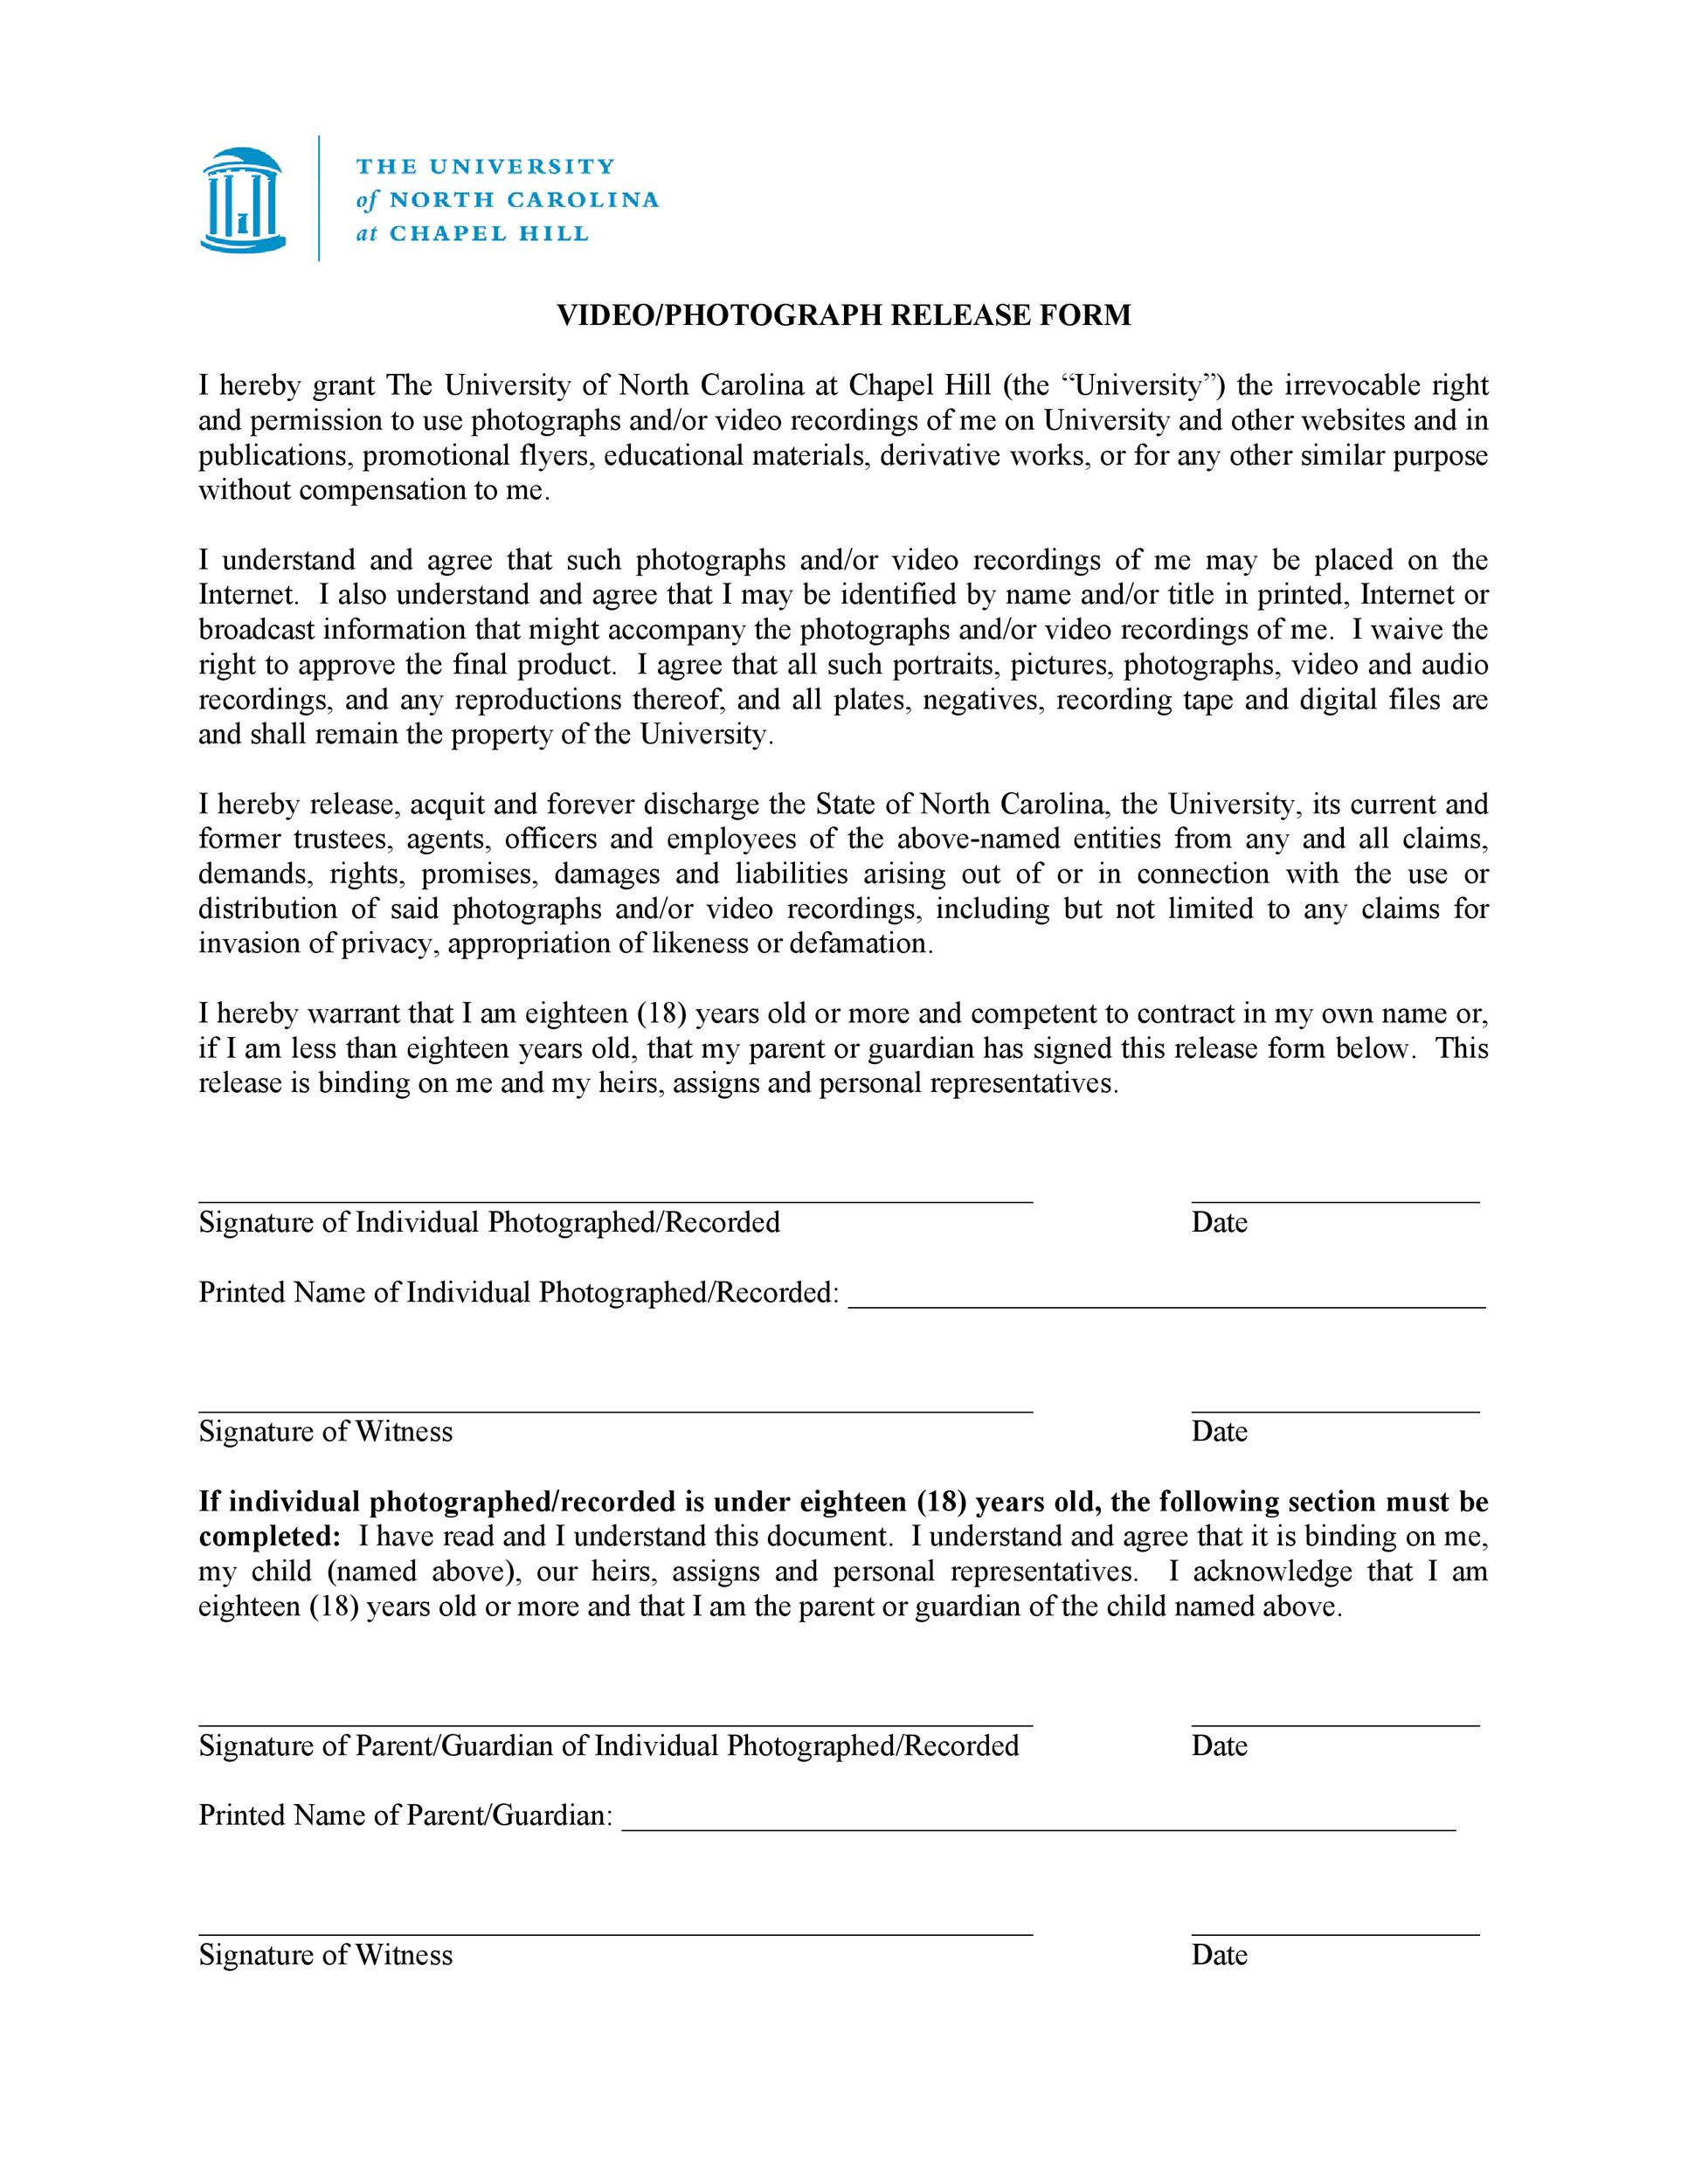 Free model release form 36